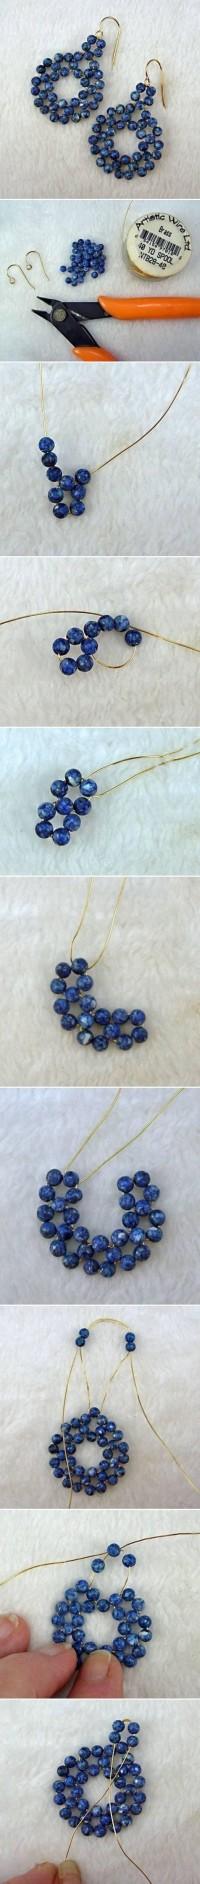 DIY Beads on Wire Earrings DIY Projects | UsefulDIY.com